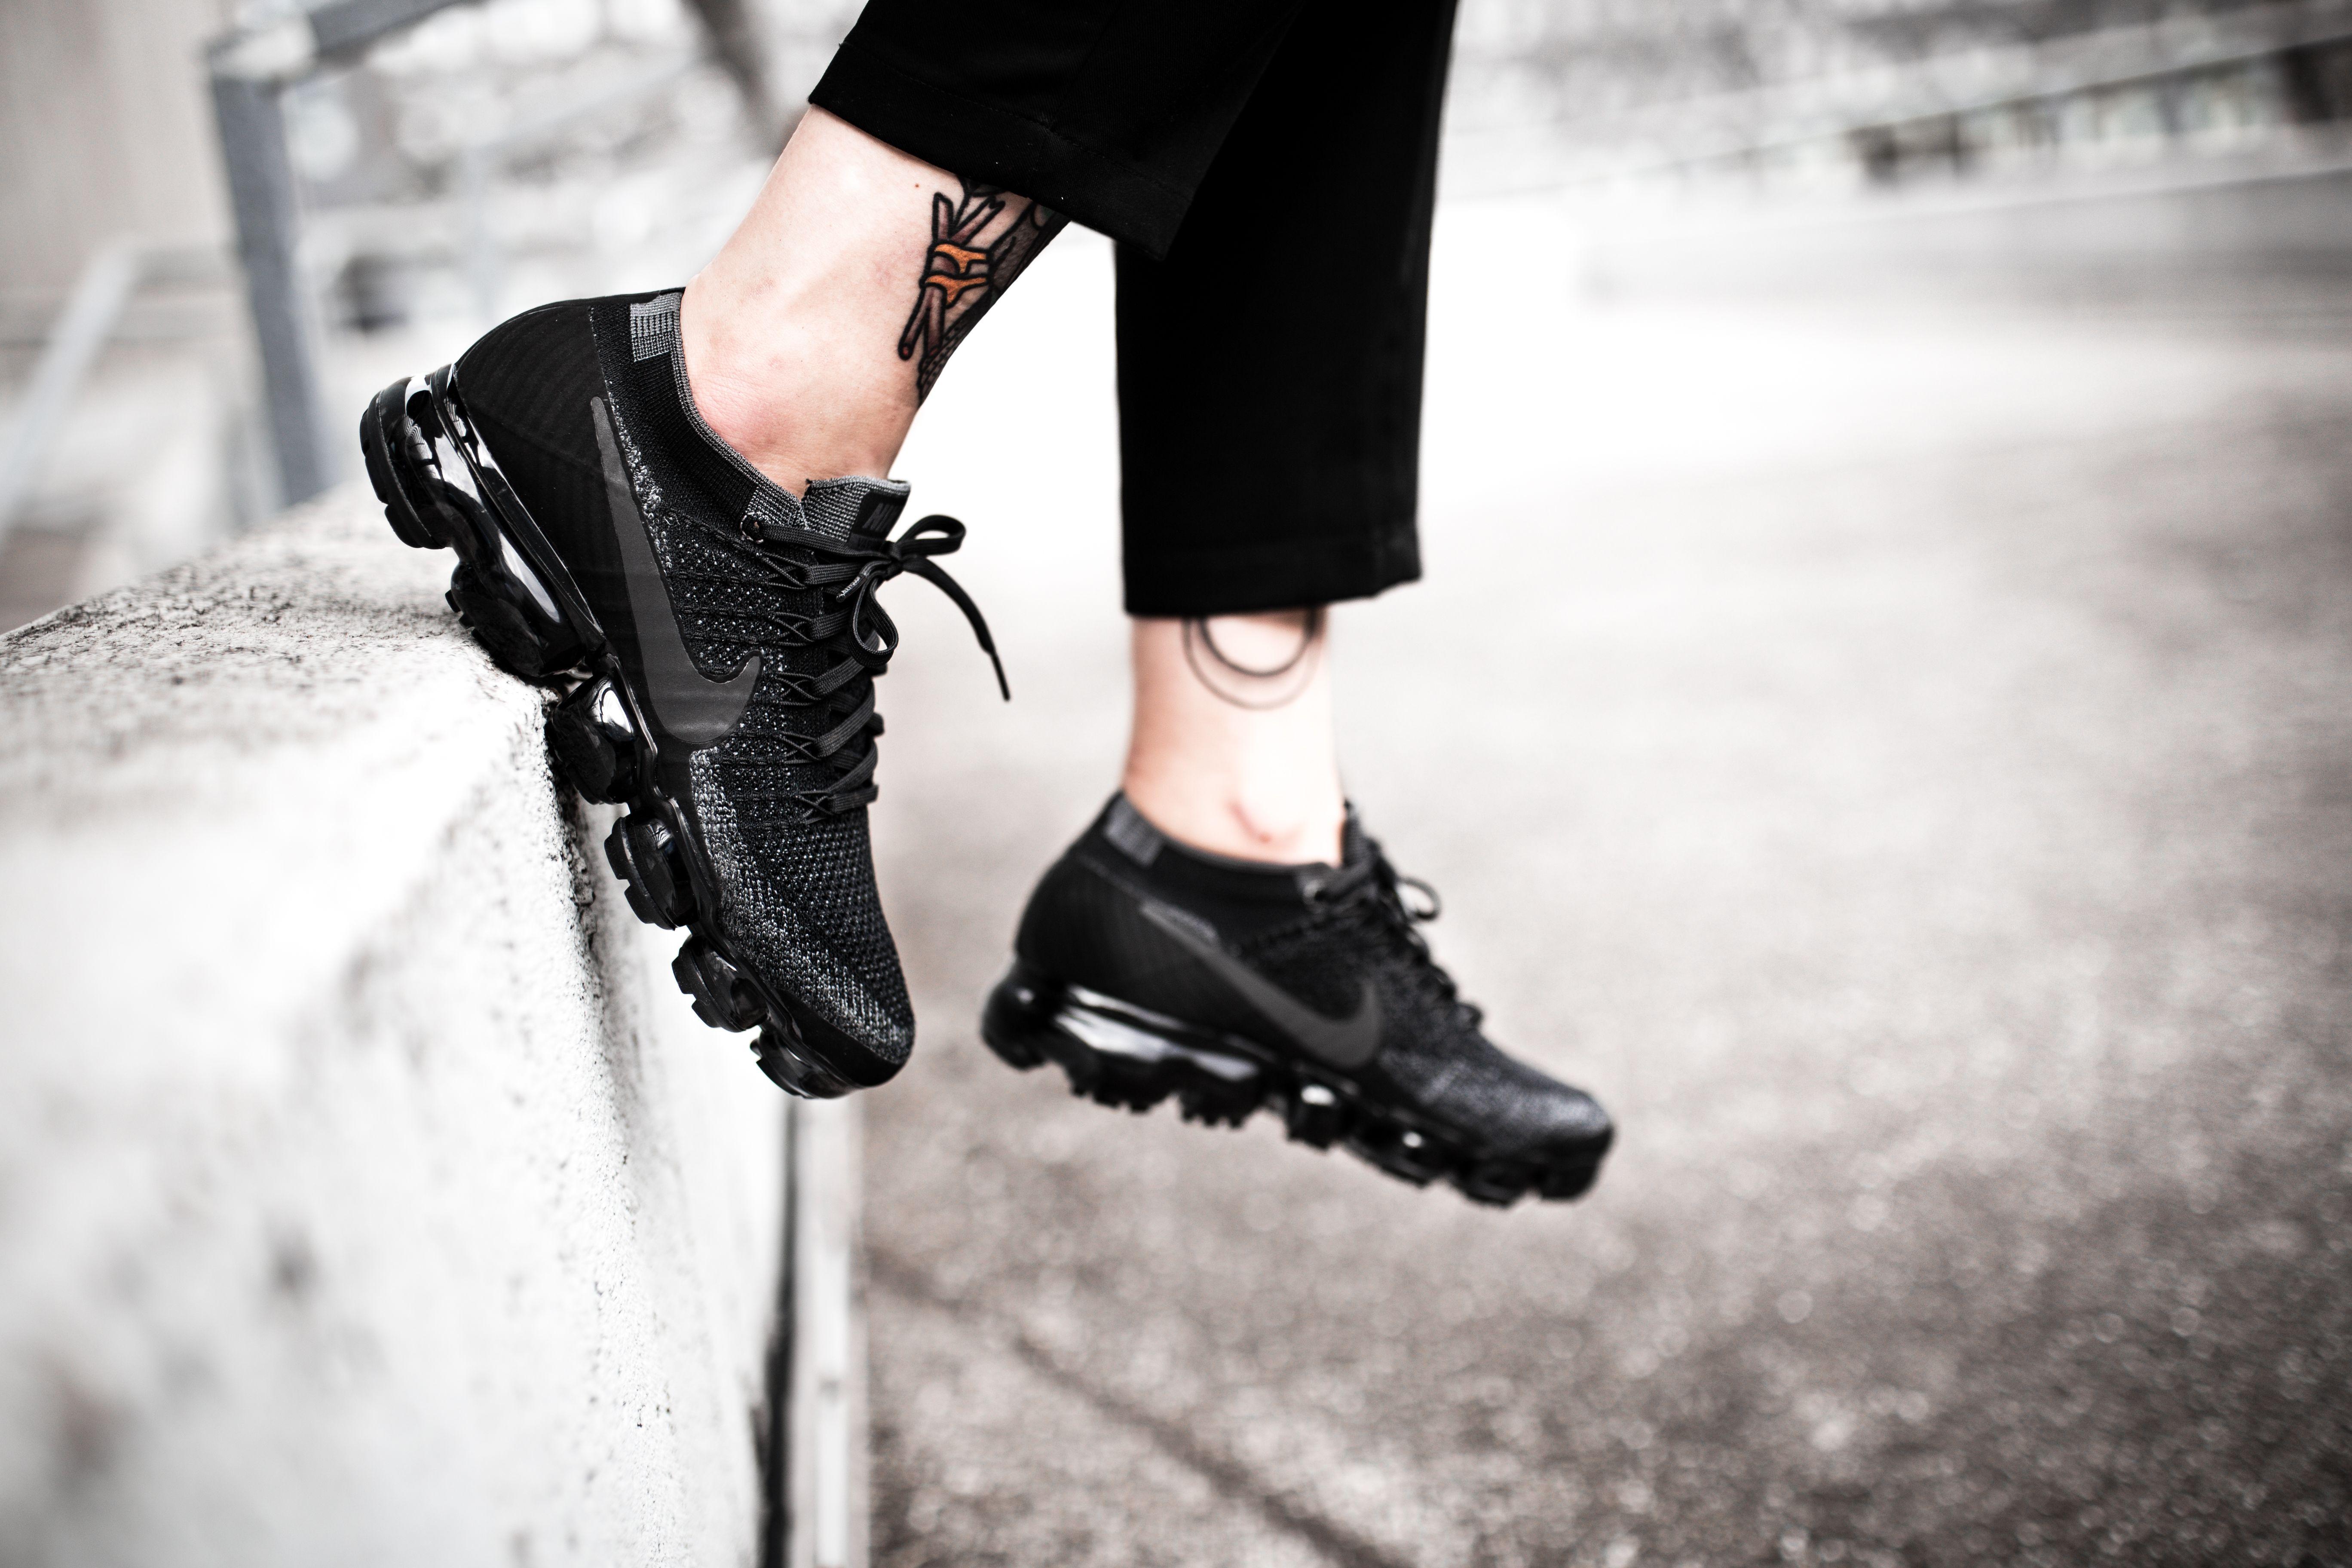 referir Marchitar tienda  nike-vapormax-1 | Sneakers men fashion, Black nike shoes, Nike fashion